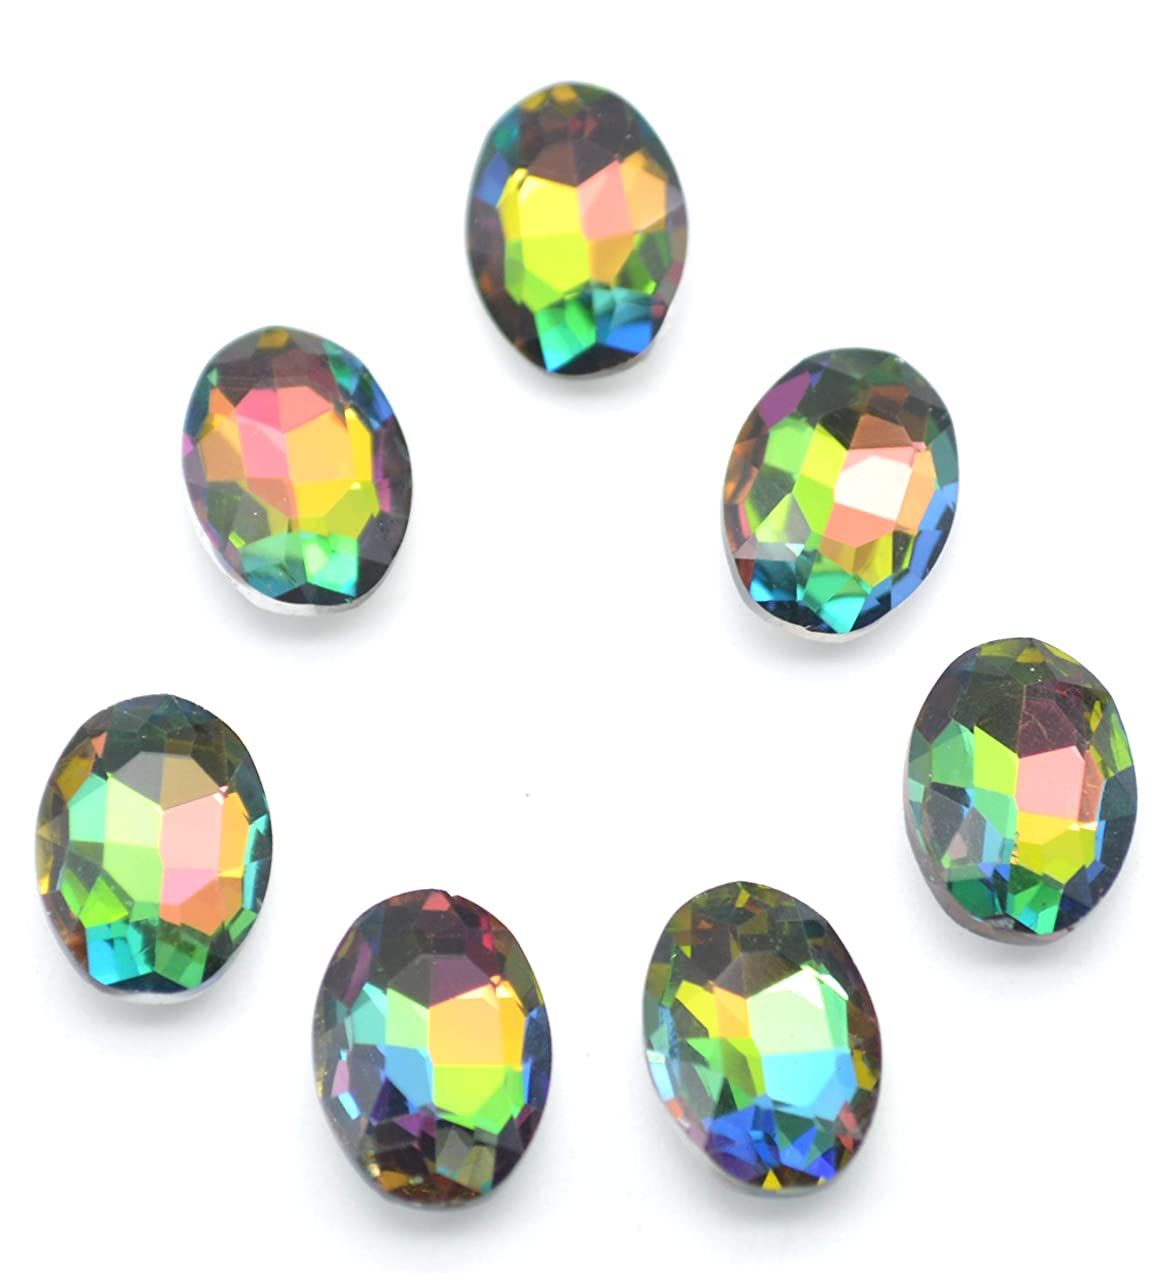 Catotrem Multifaceted Gemstone Ellipse Glass Beads Vibrant Color Diamante for DIY Project 10X14mm, 50pcs(Vitrail Medi)